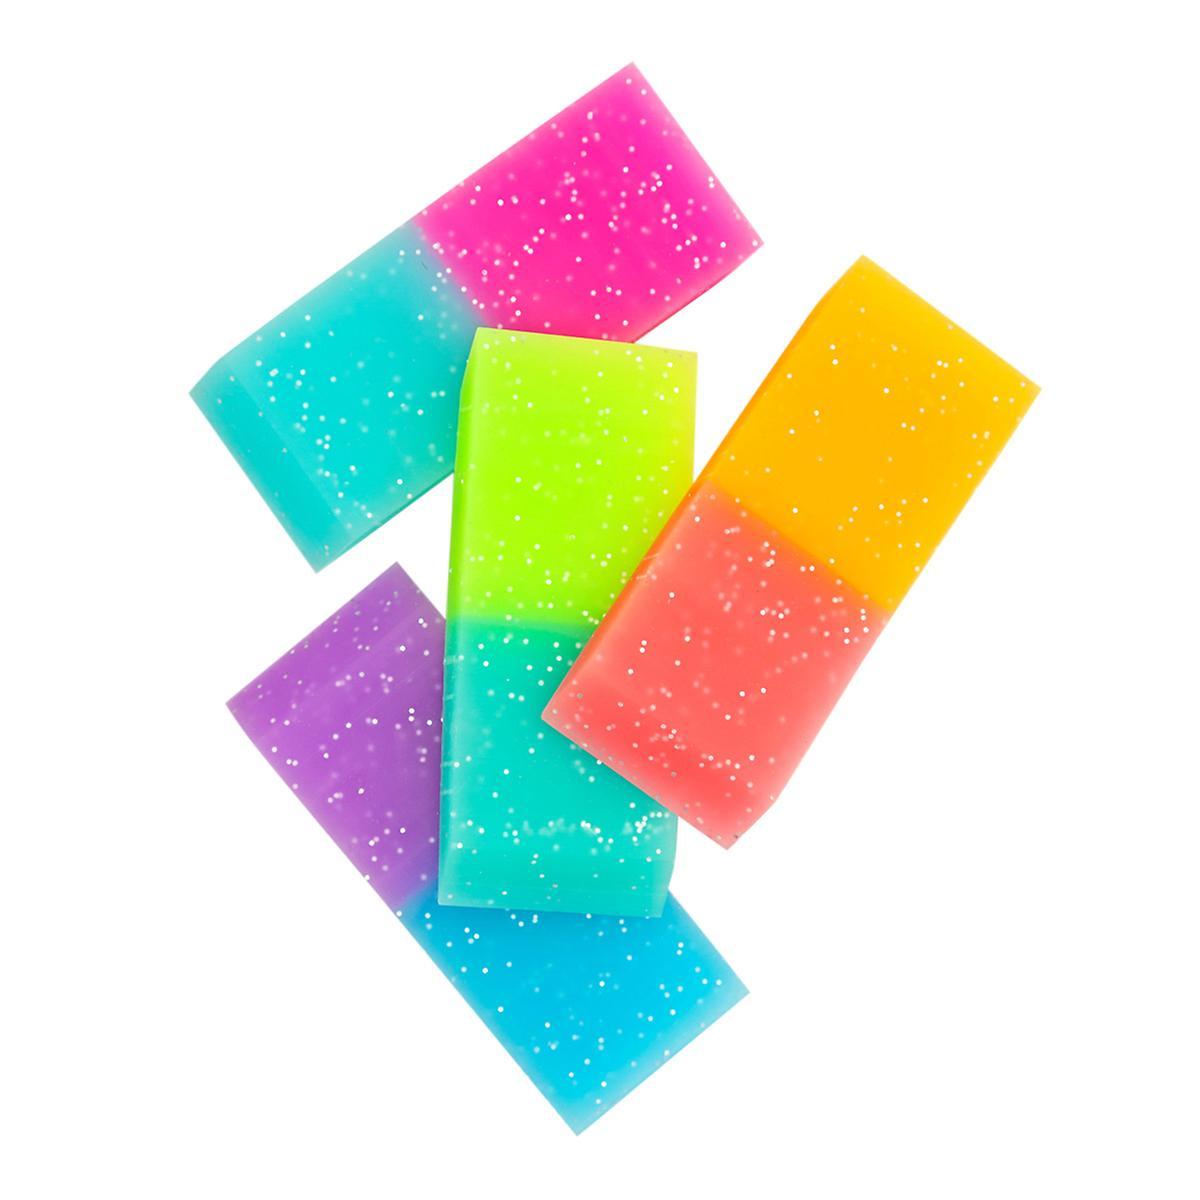 Ooly Jumbo Ombre Eraser